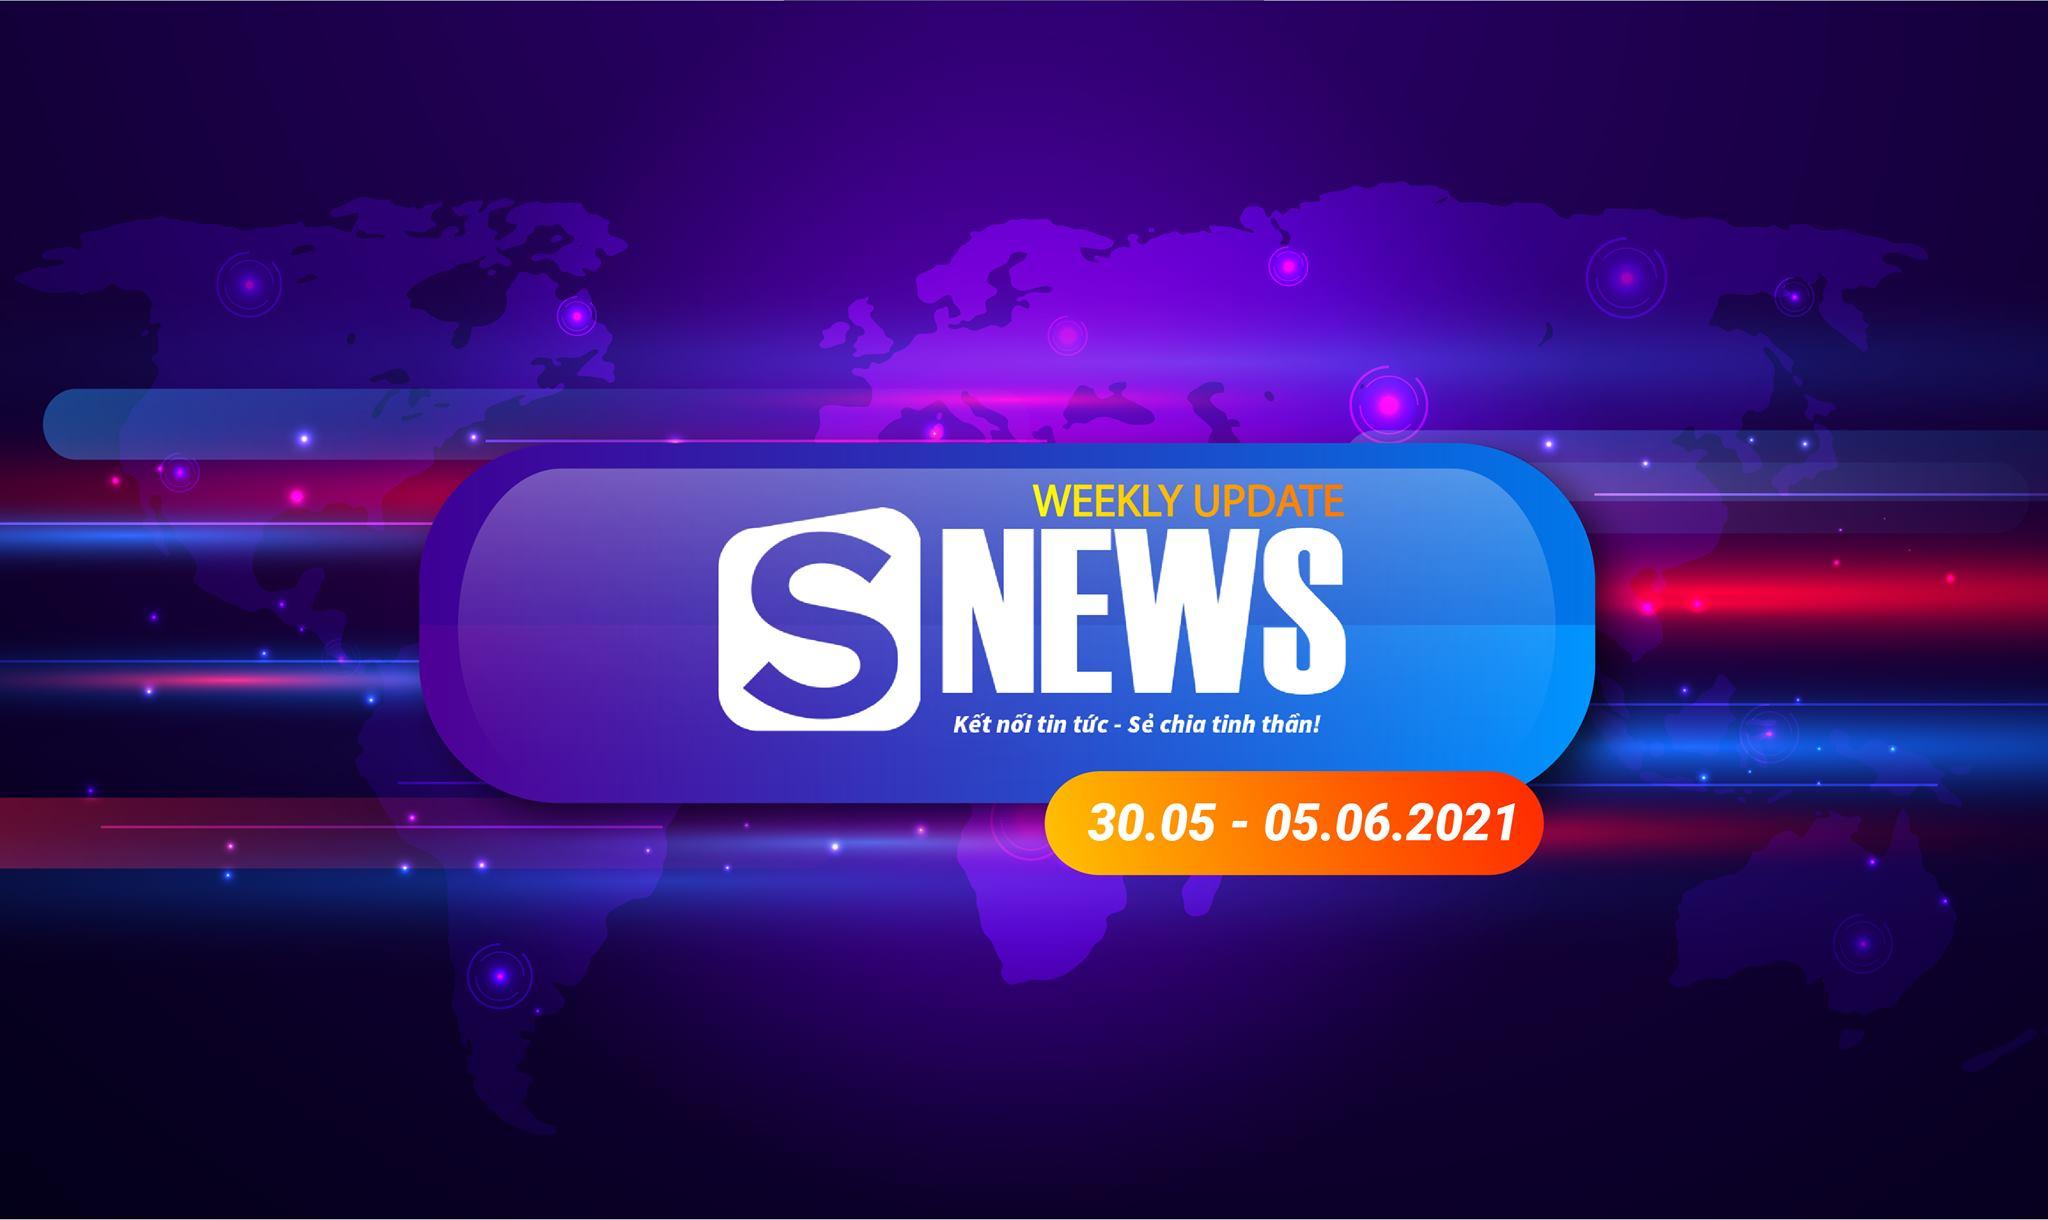 Tổng hợp tin tức Sapo tuần qua: 30.05.2021 - 05.06.2021